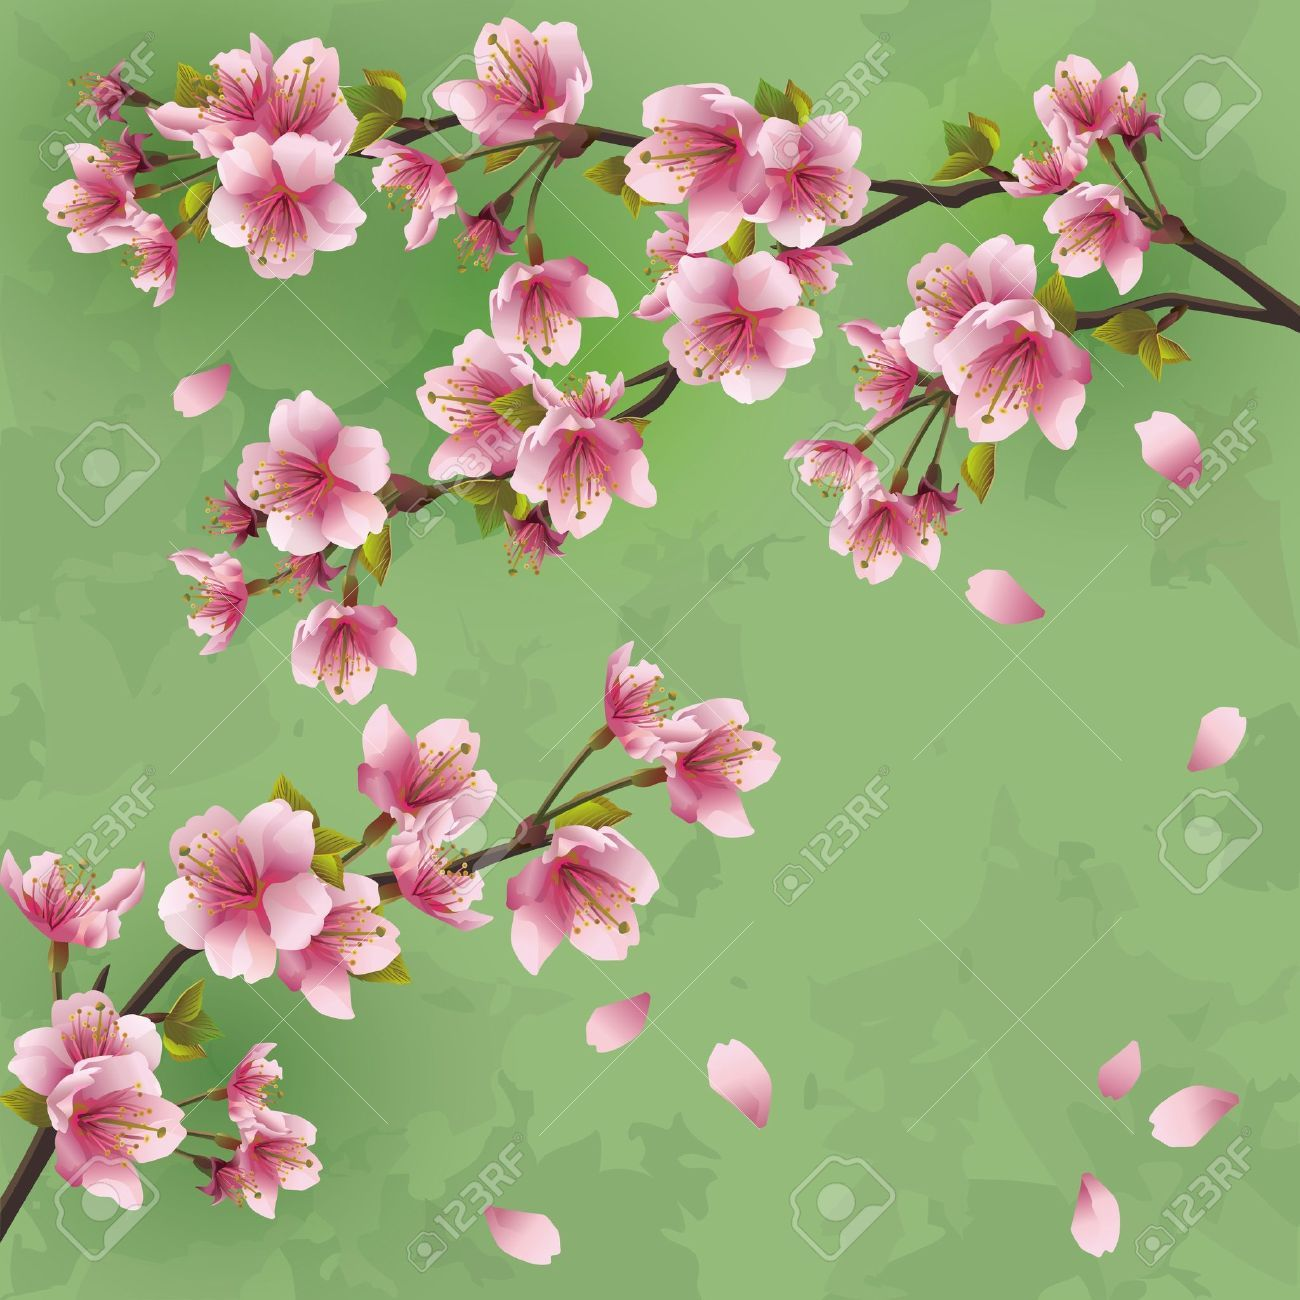 vintage cherry blossom illustration - Google zoeken   Dekupaj ...